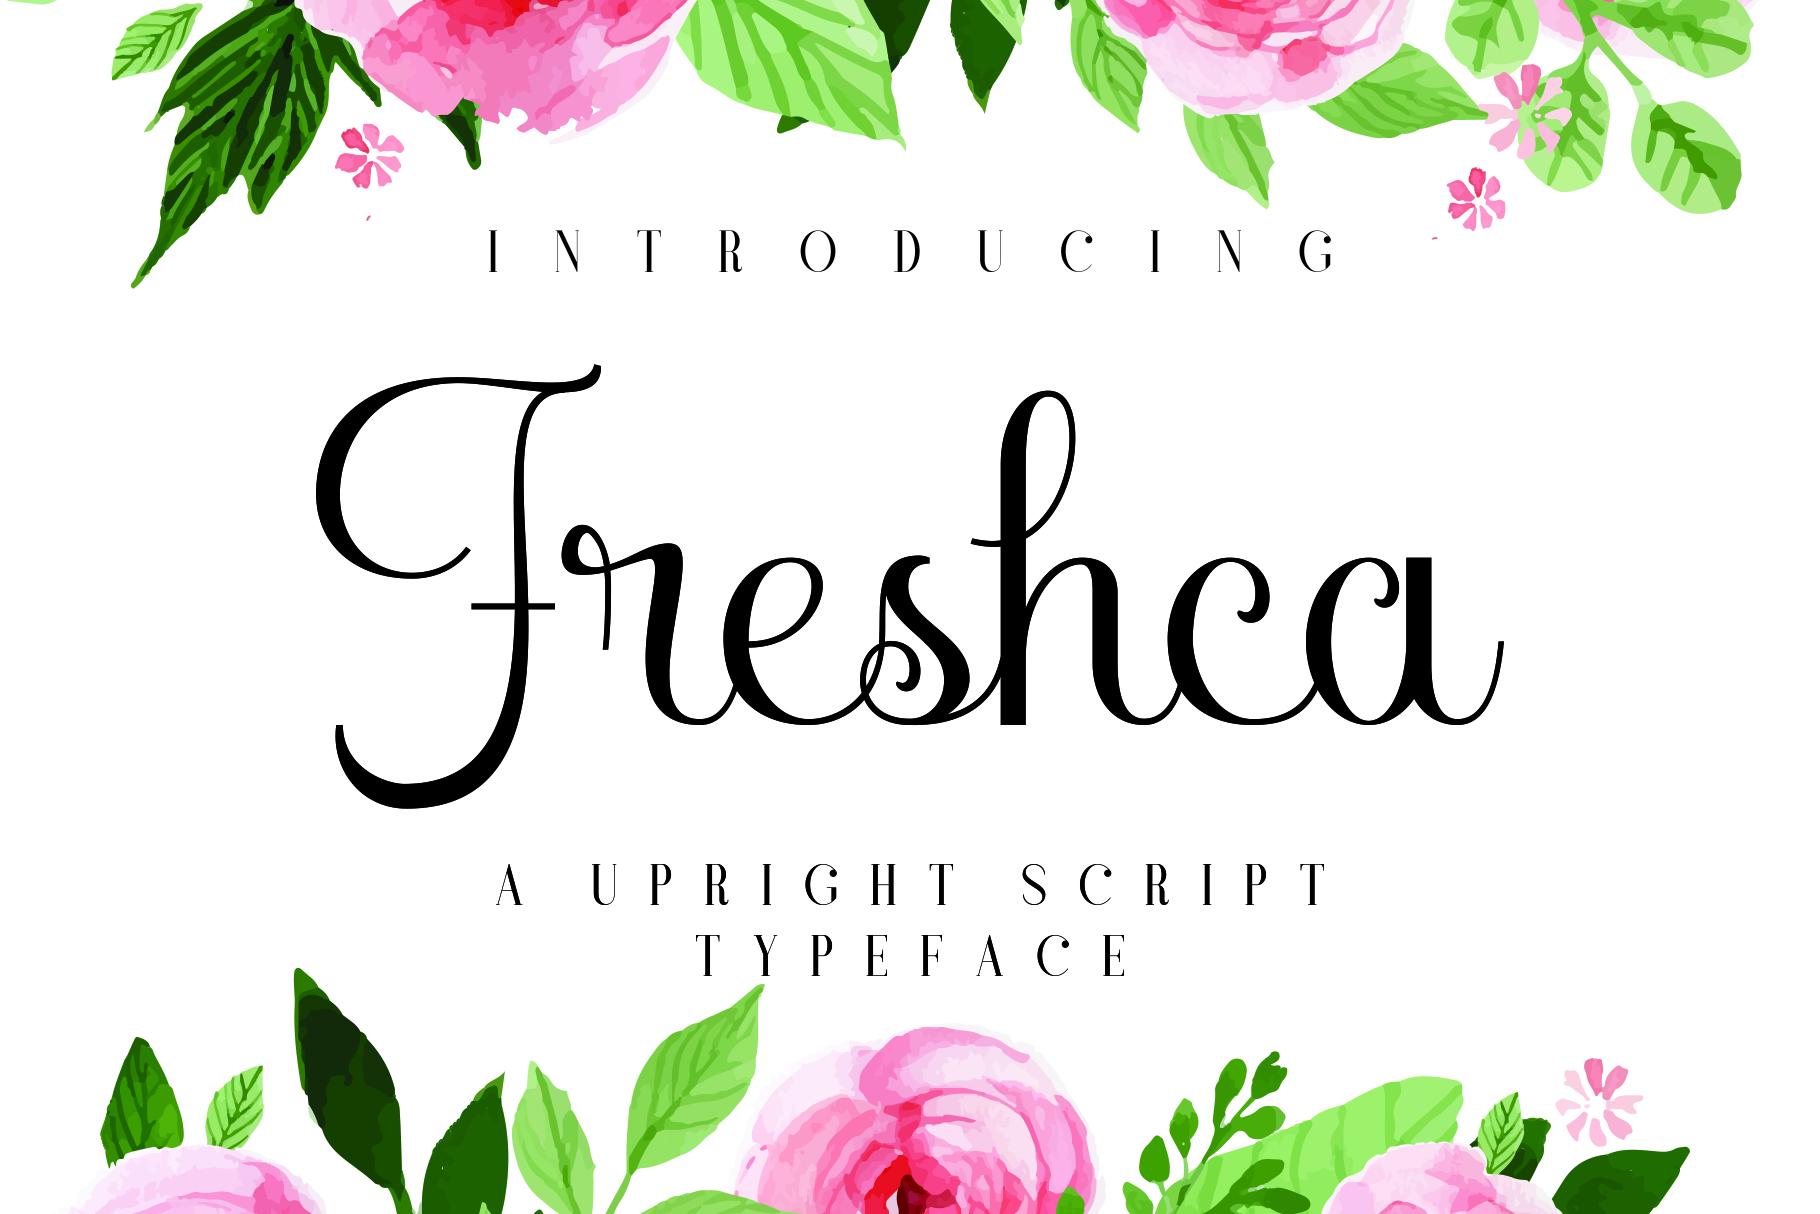 Freshca - free upright script font